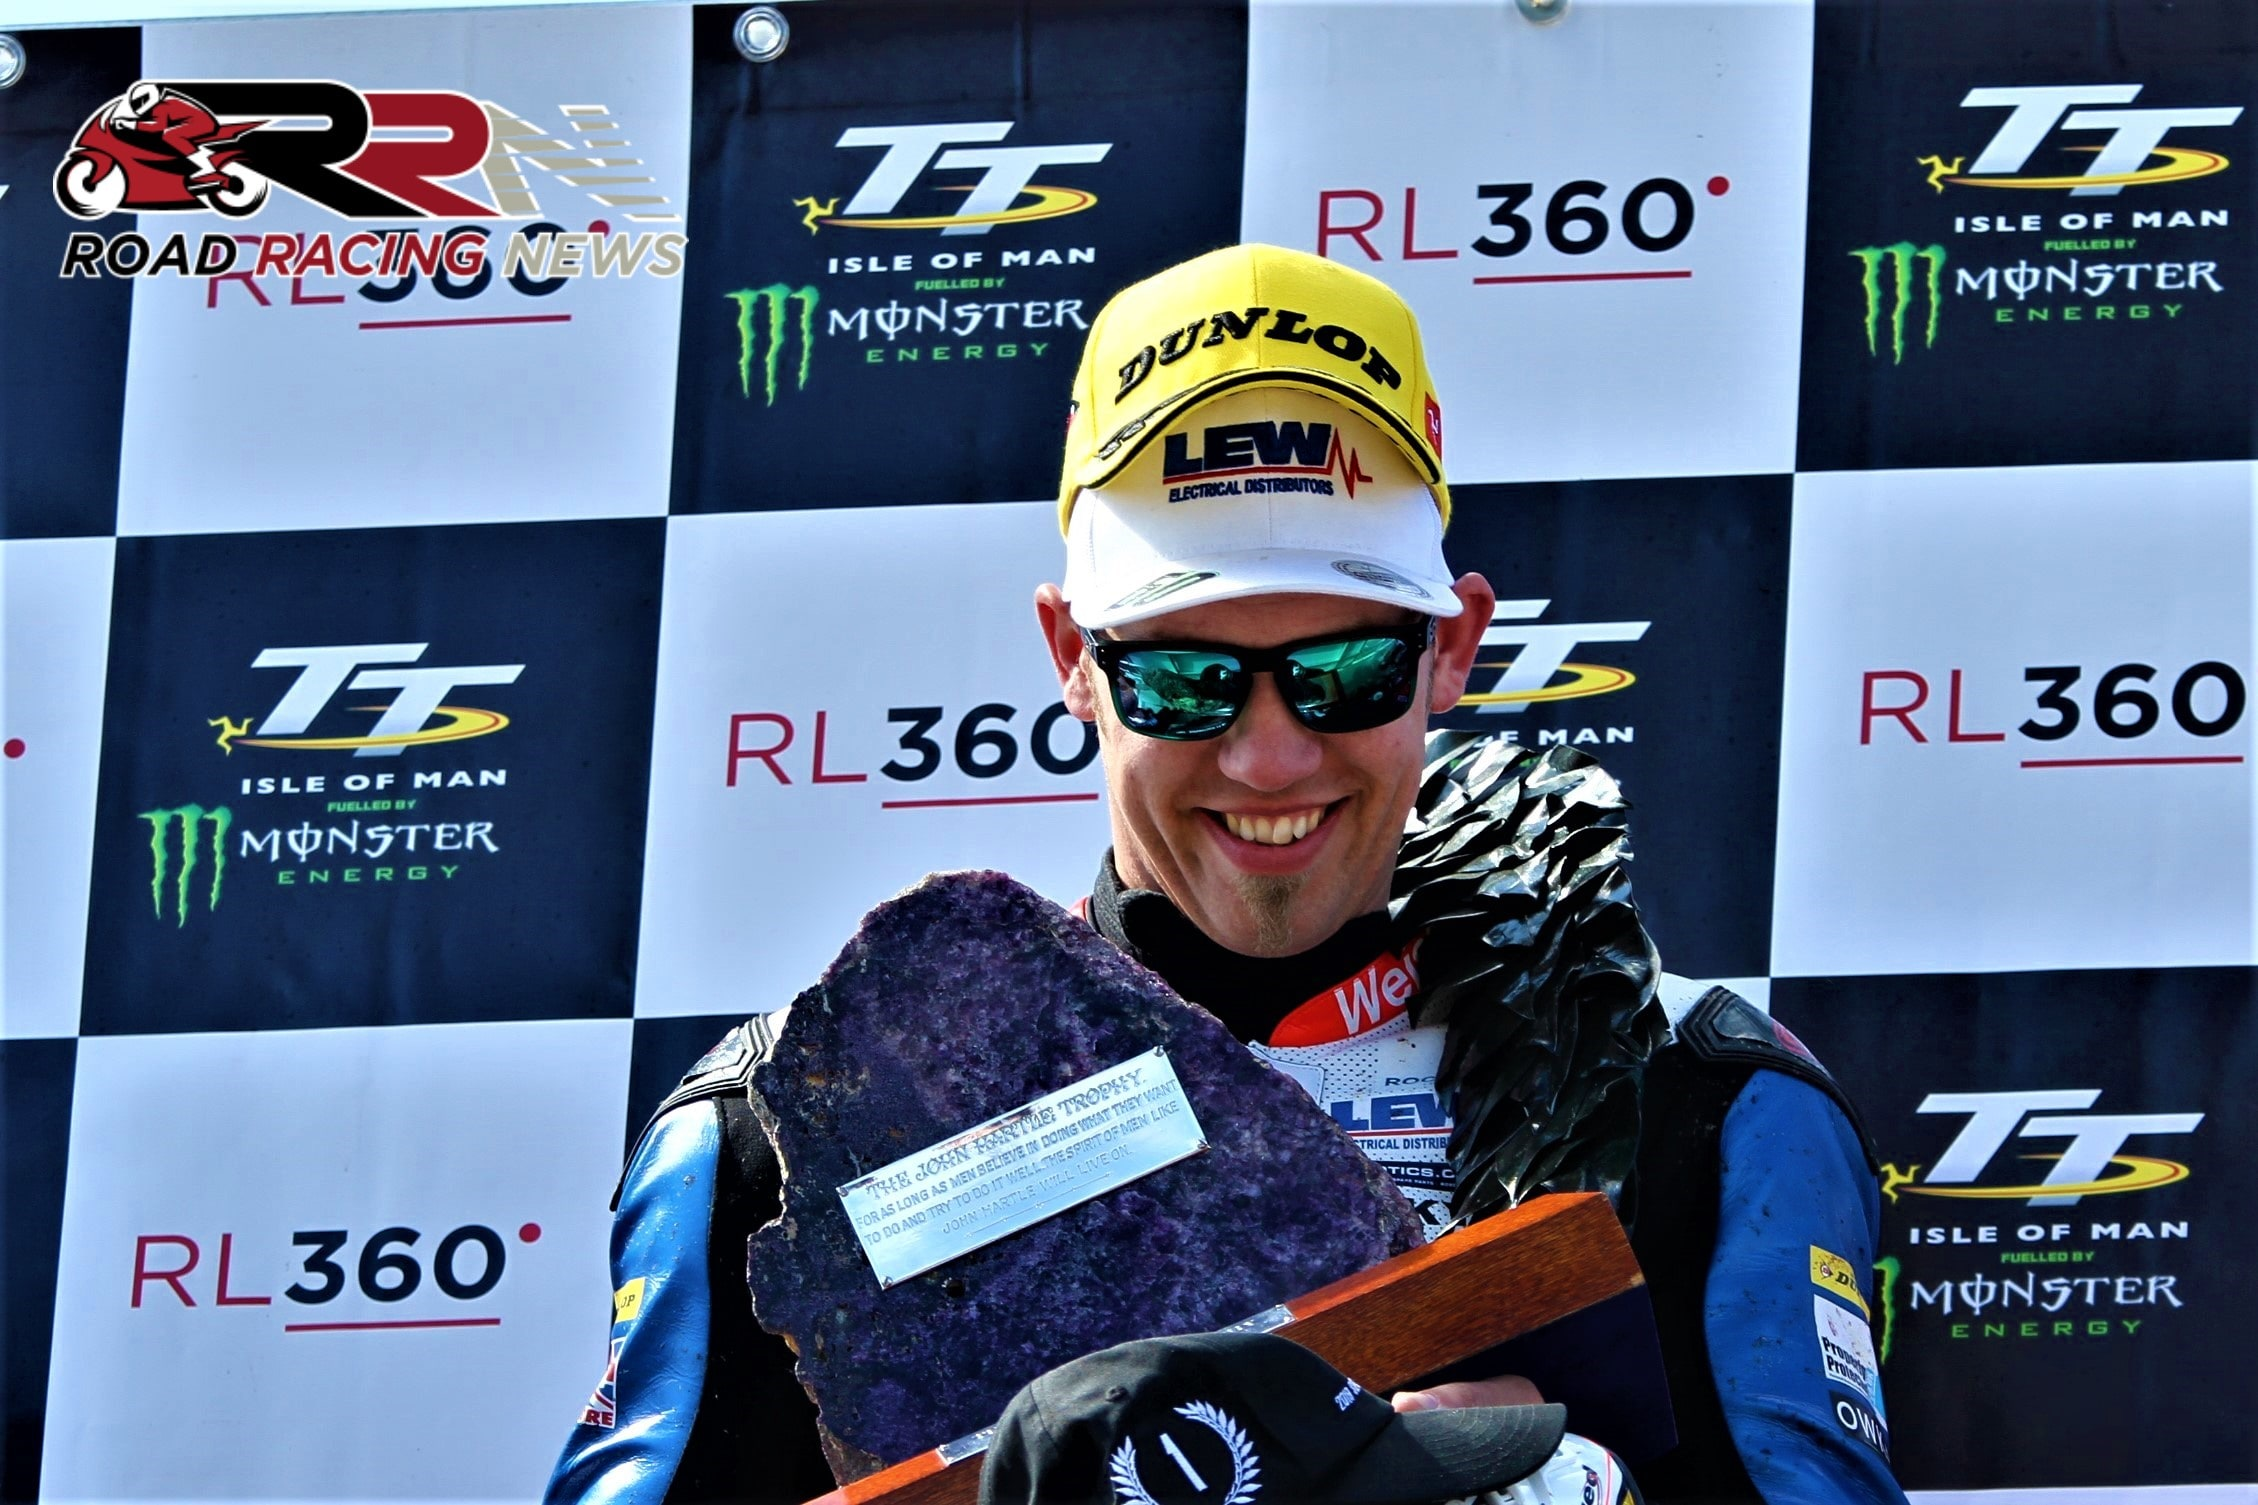 TT 2019: Sizzling Hickman Retains Superstock Crown, Johnson Pips Dunlop For First TT Podium